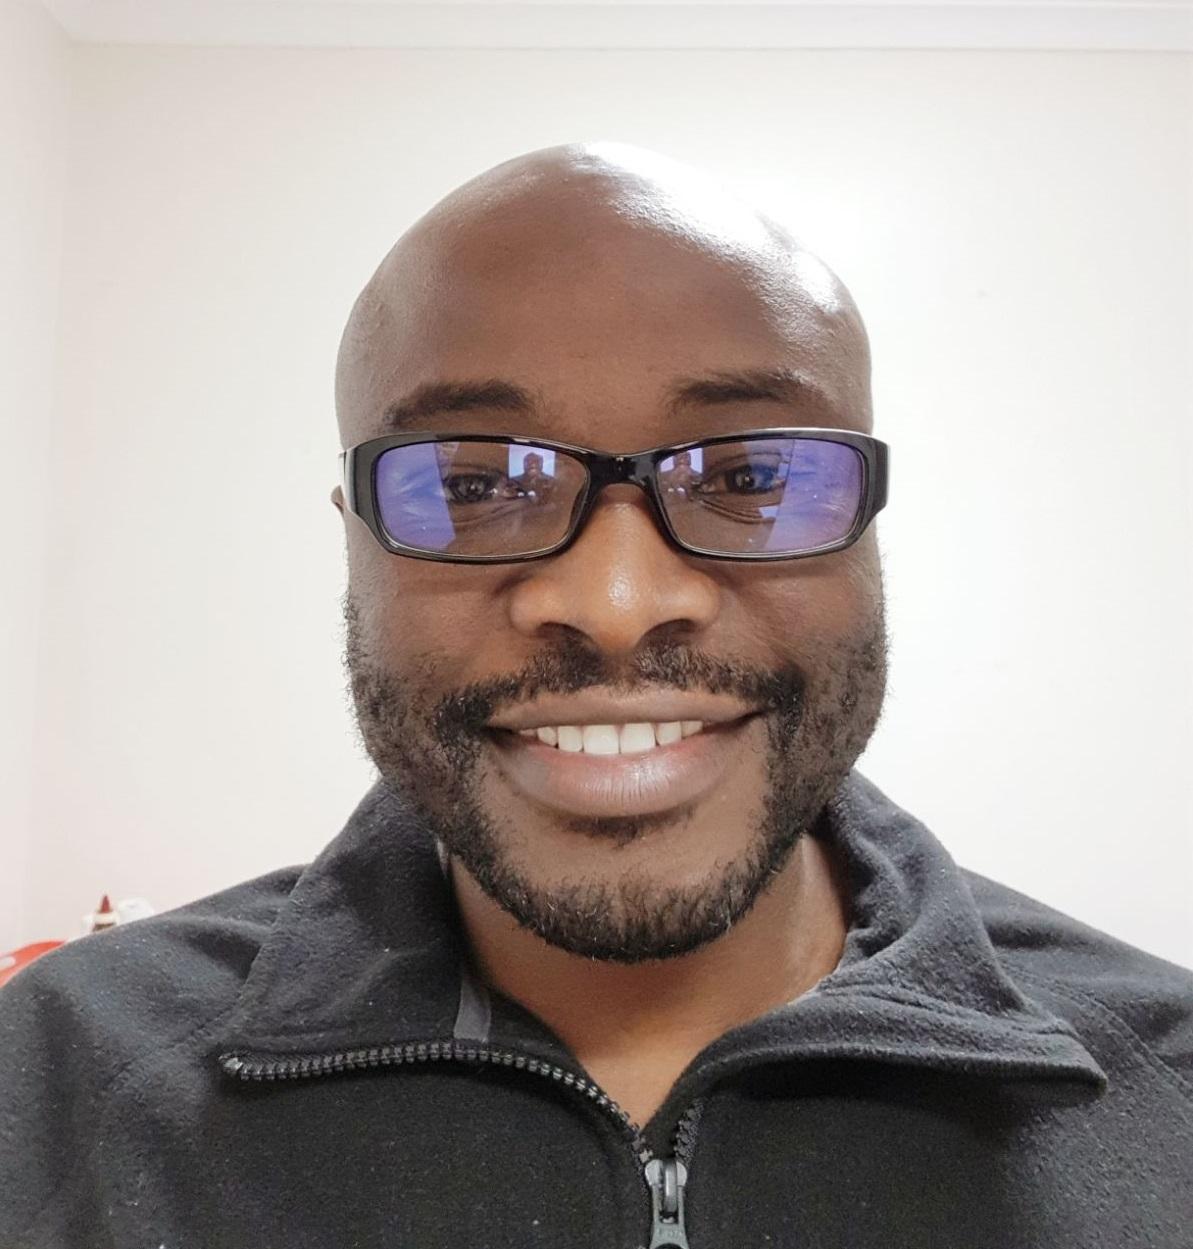 Eugie Kabwe